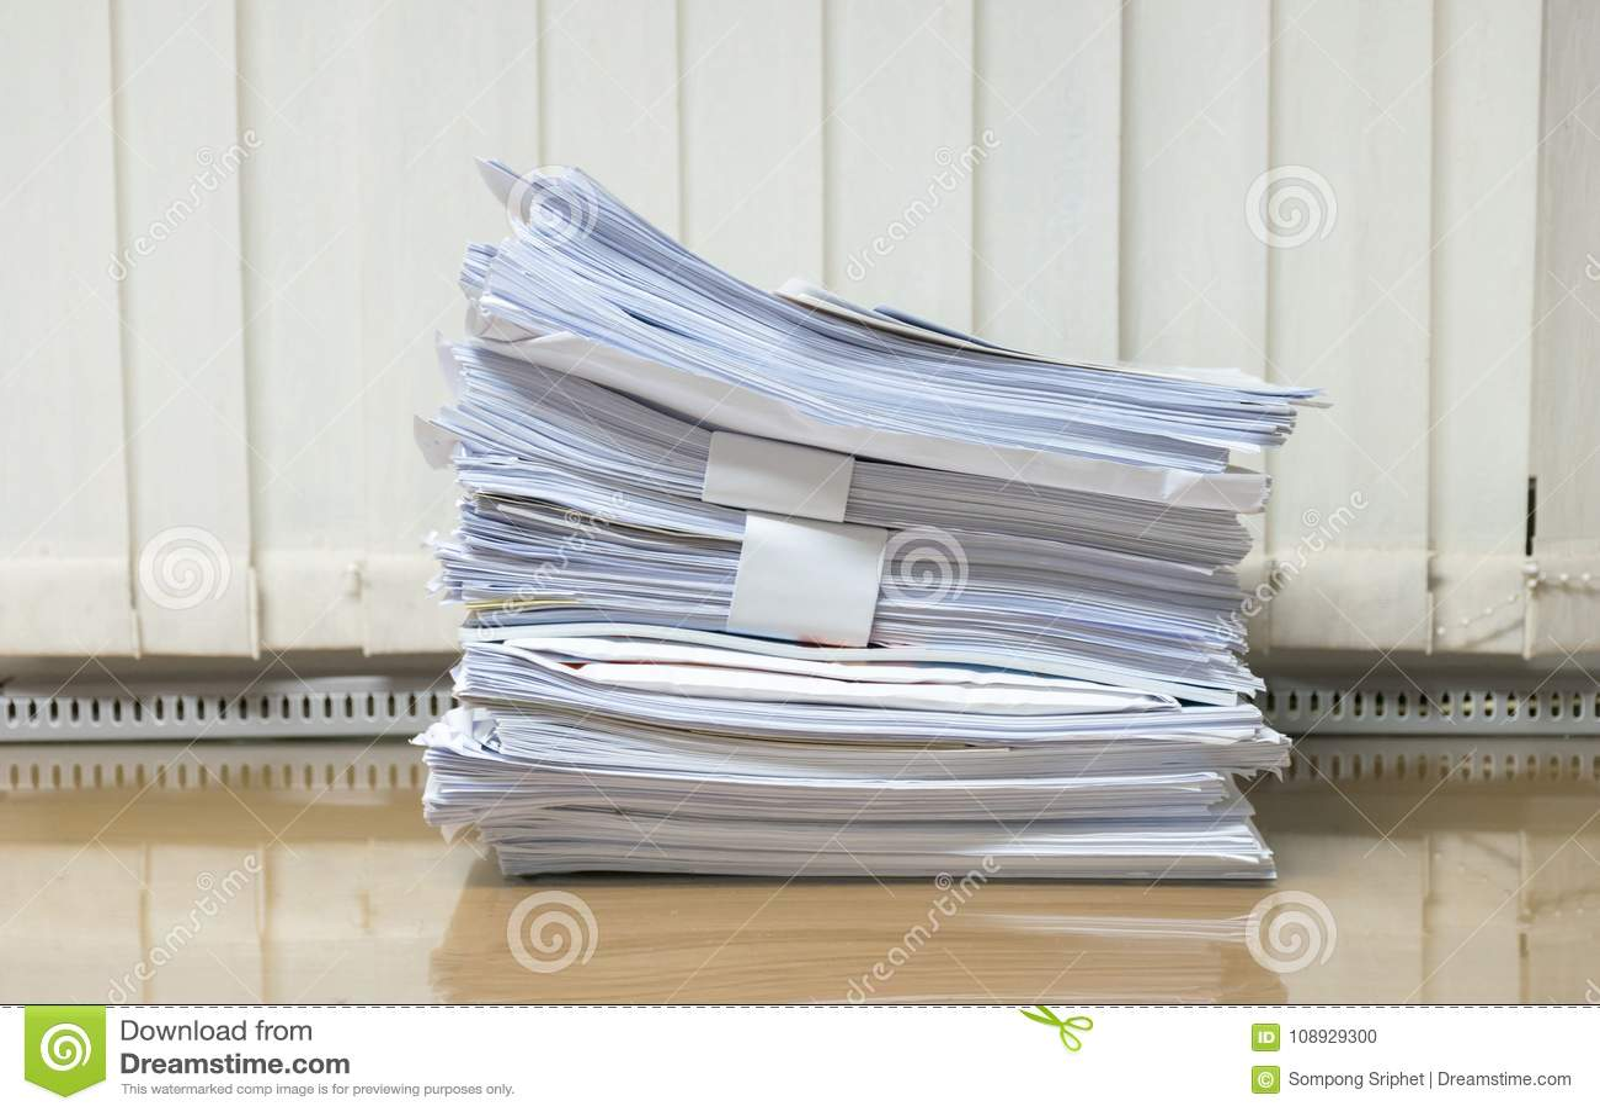 desk office file document paper tray desk lot of work document paper on the desk office of work document paper on the desk office stock photo image